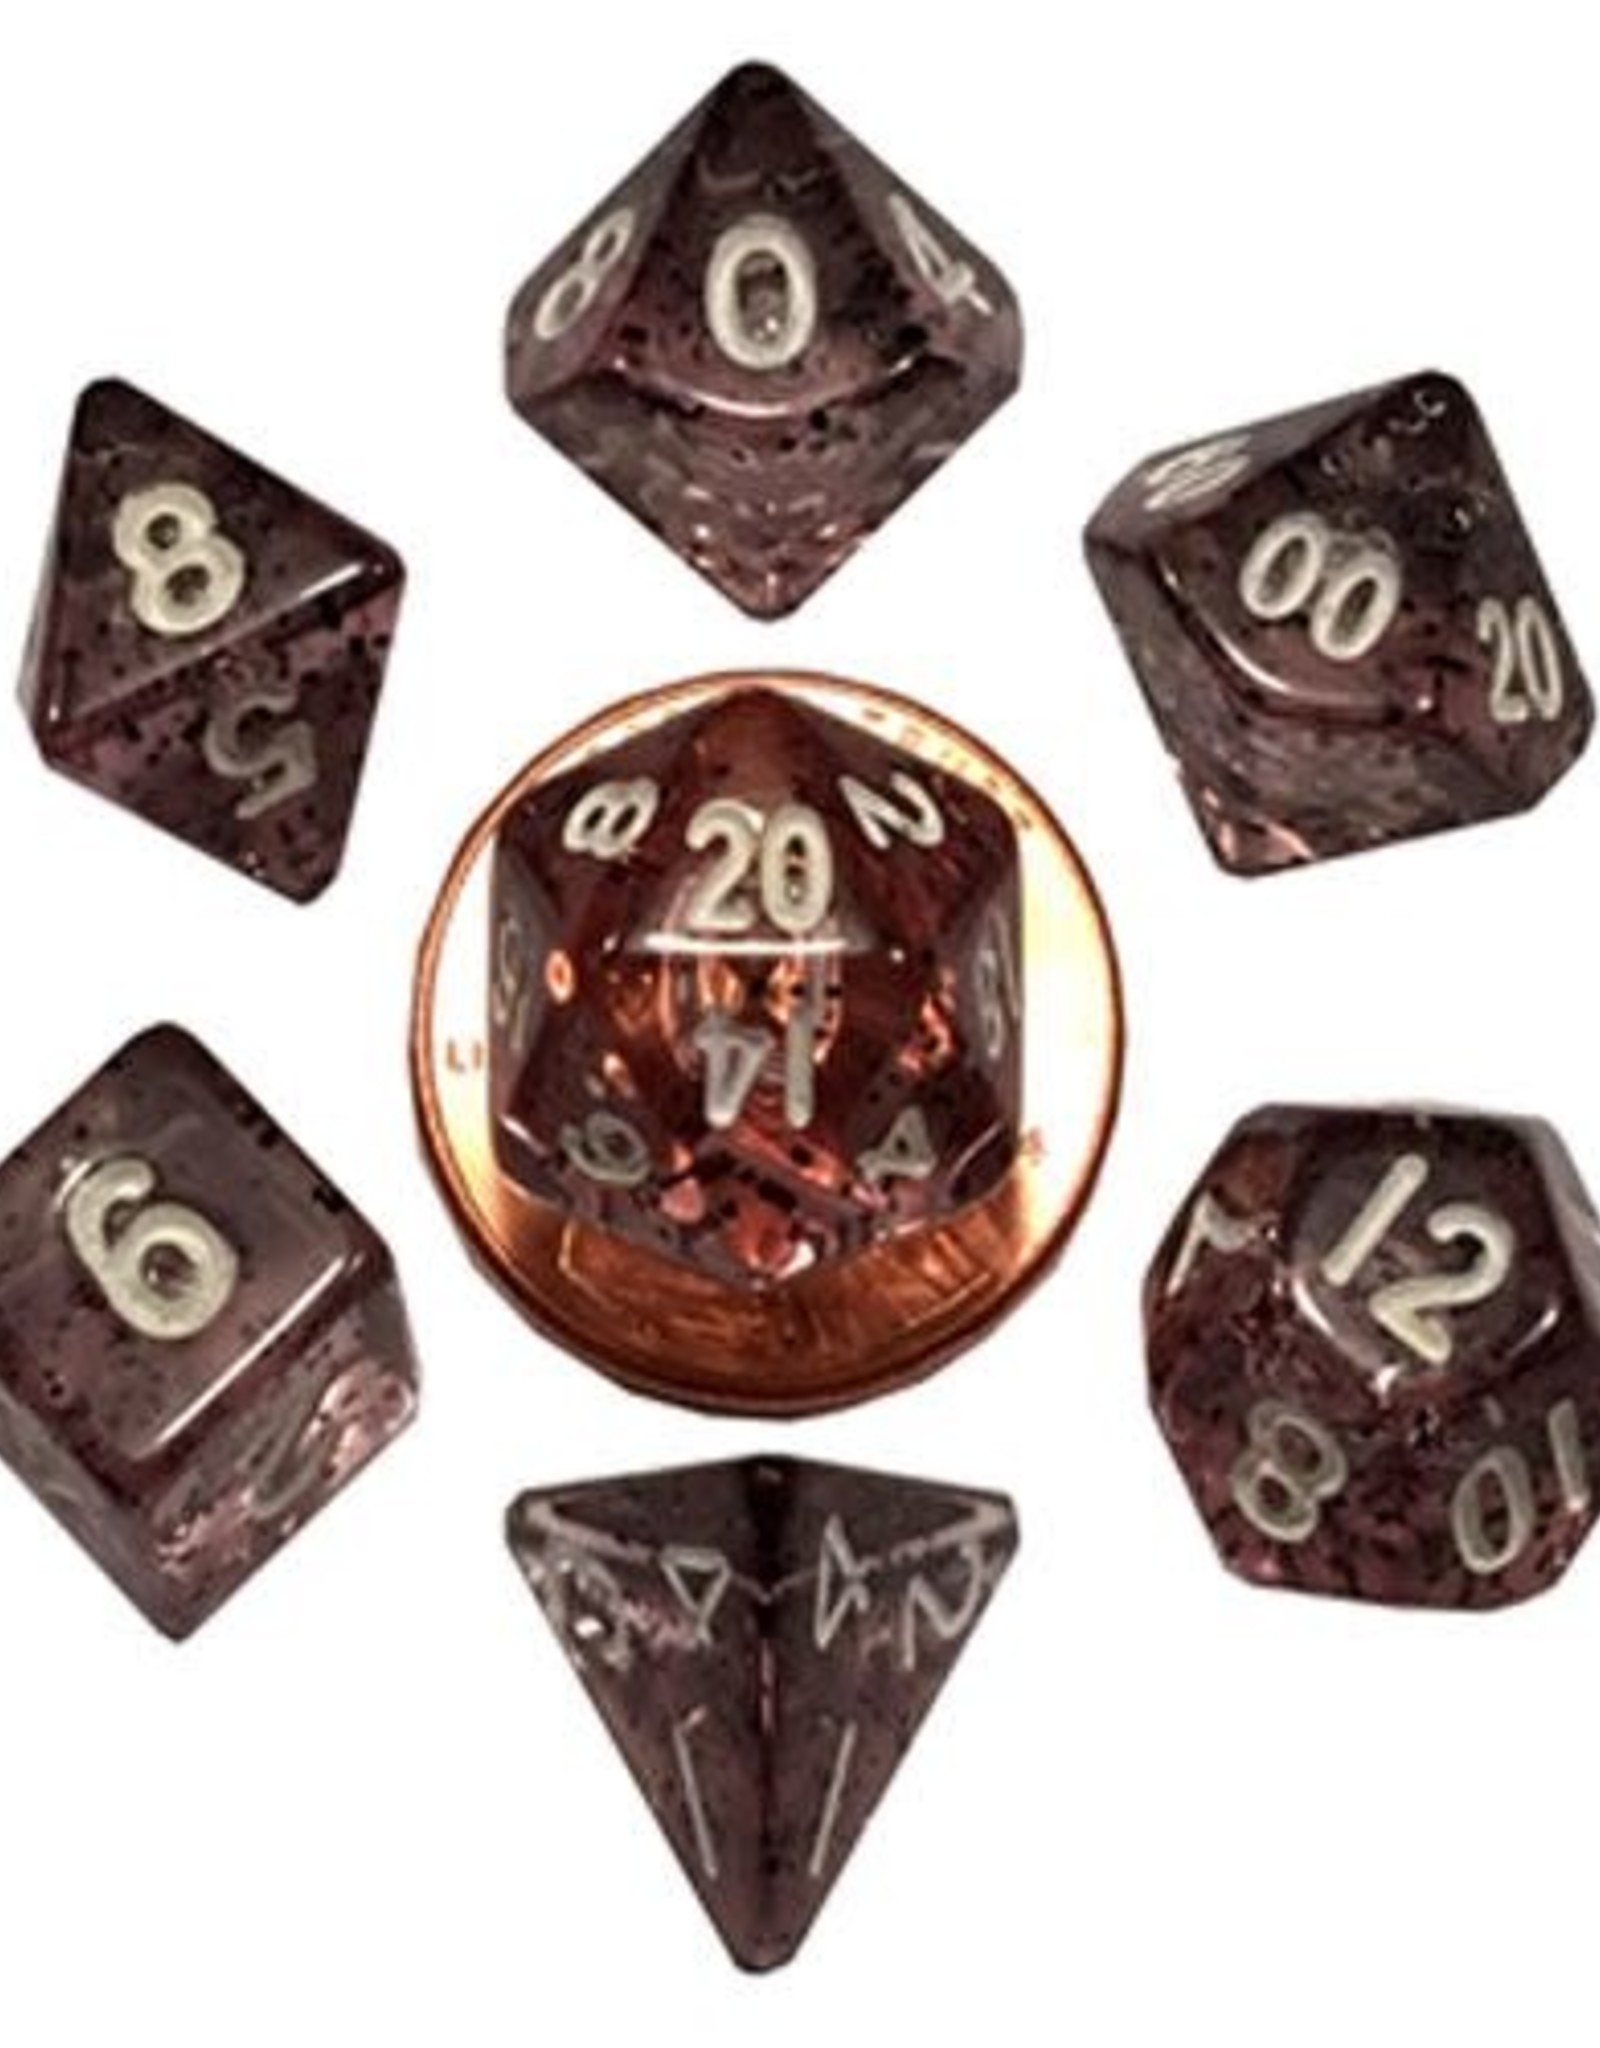 Metallic Dice Games Mini Dice 7ct. - Ether Black w/White